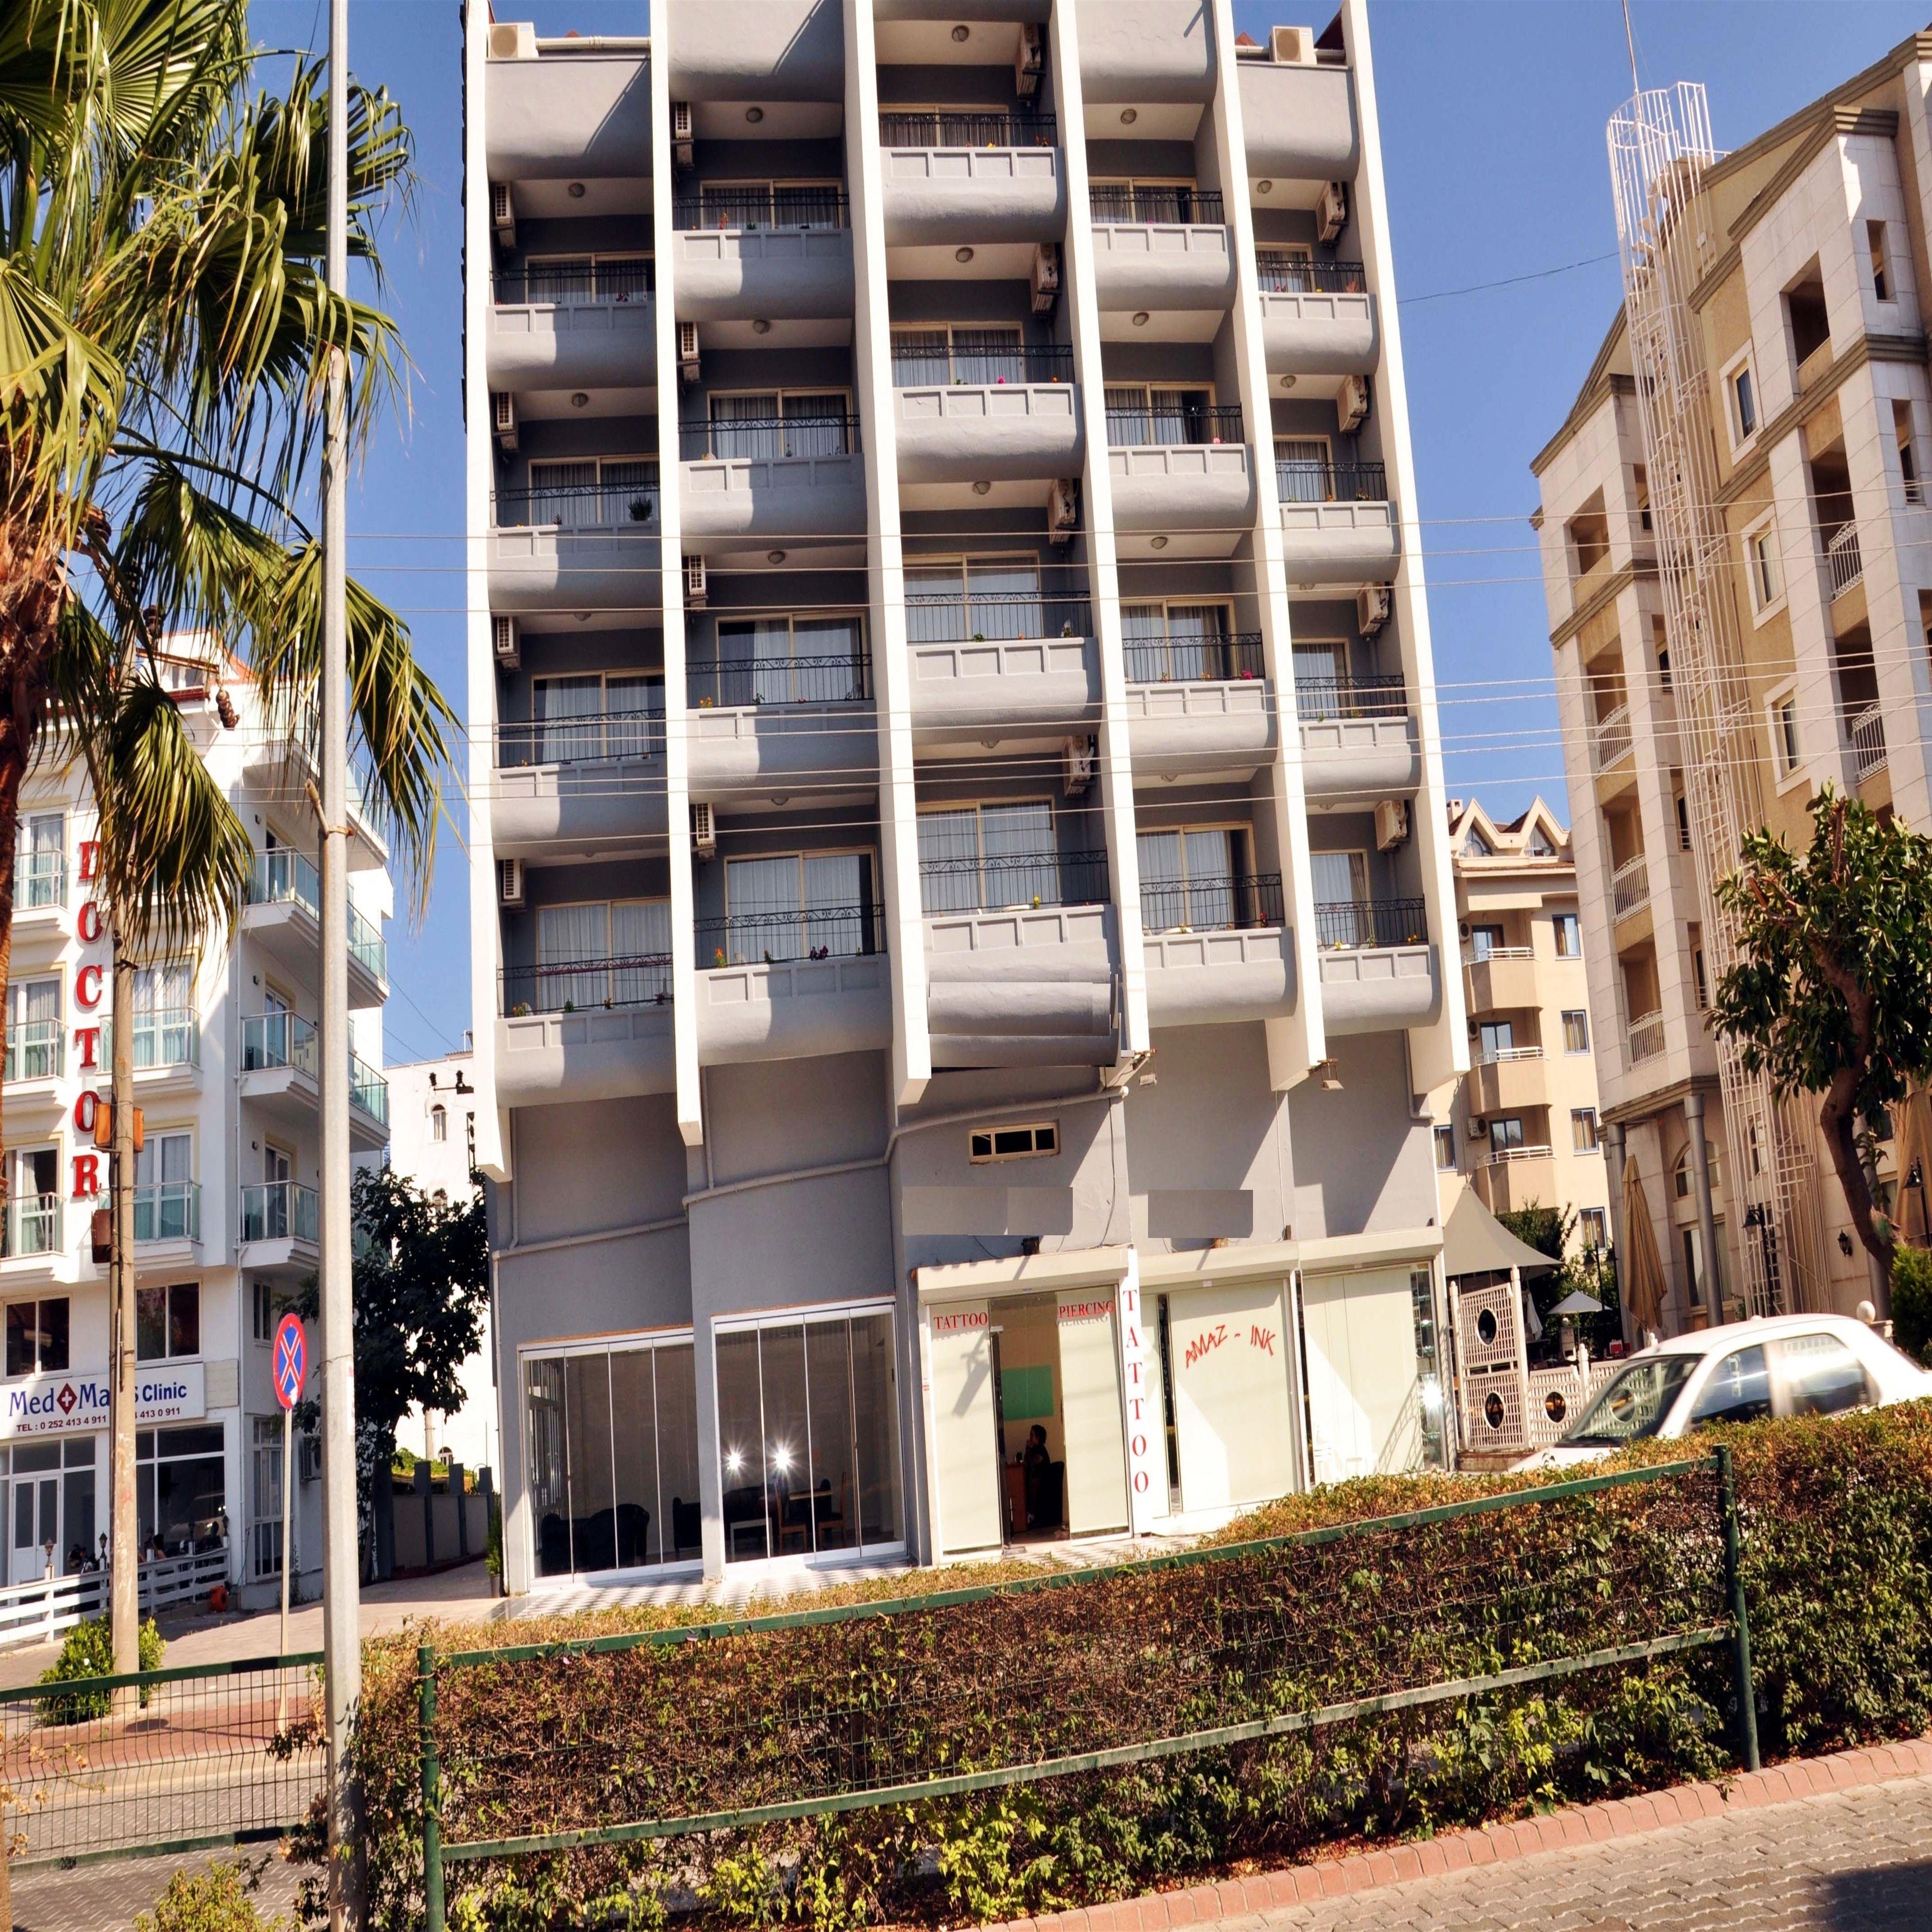 Almena City